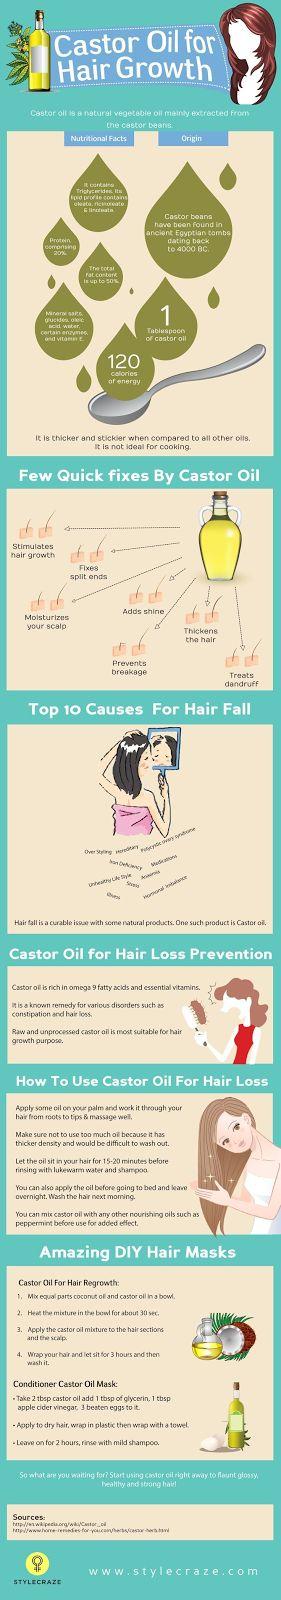 Castor Oil for Hair Growth                                                                                                                                                                                 More